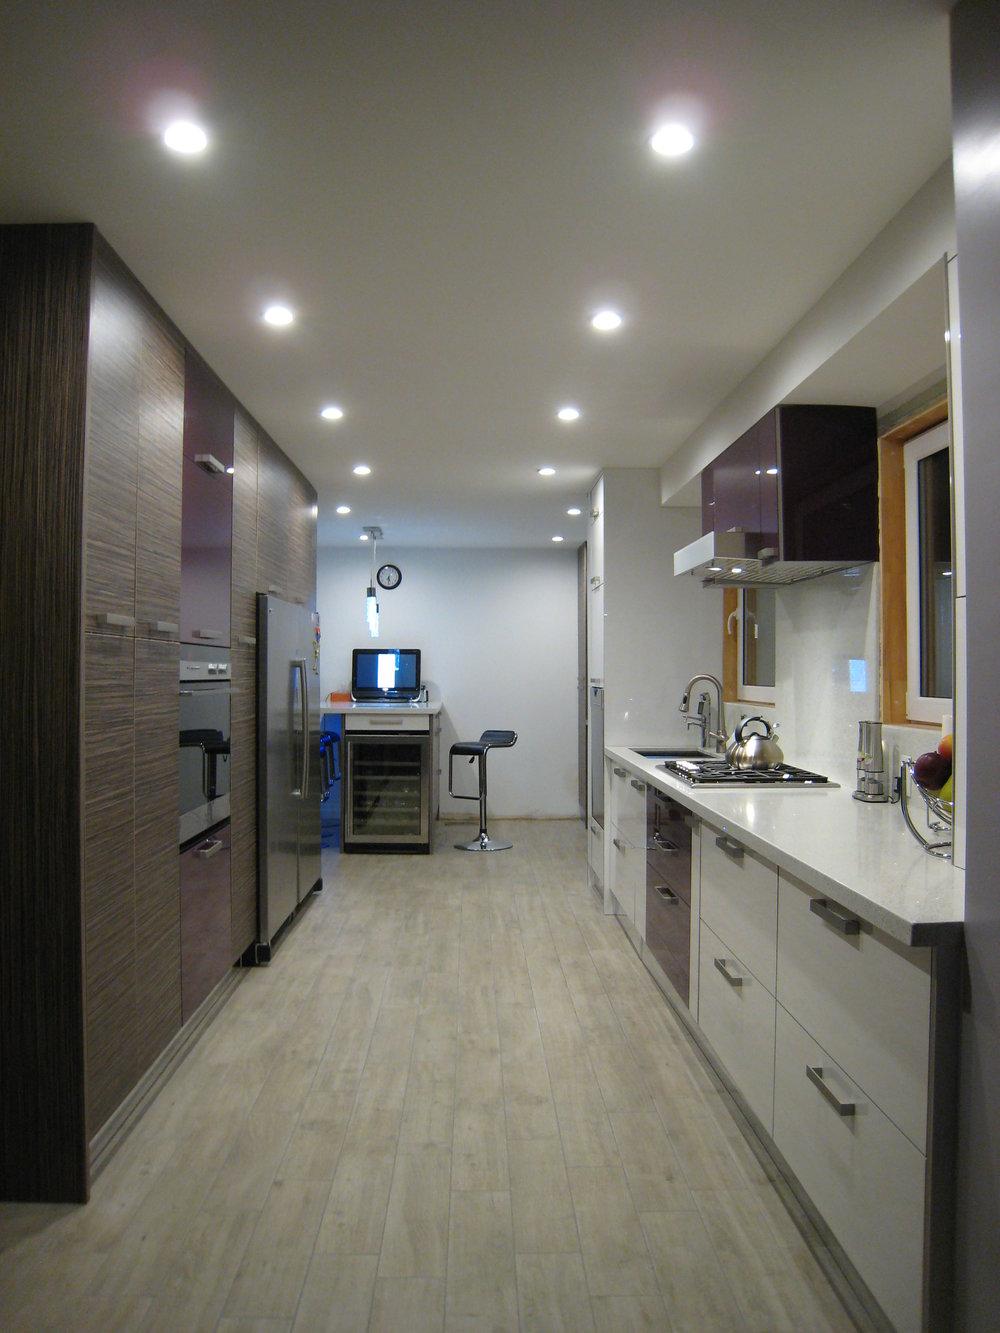 Kitchen 2 Pic 5.JPG